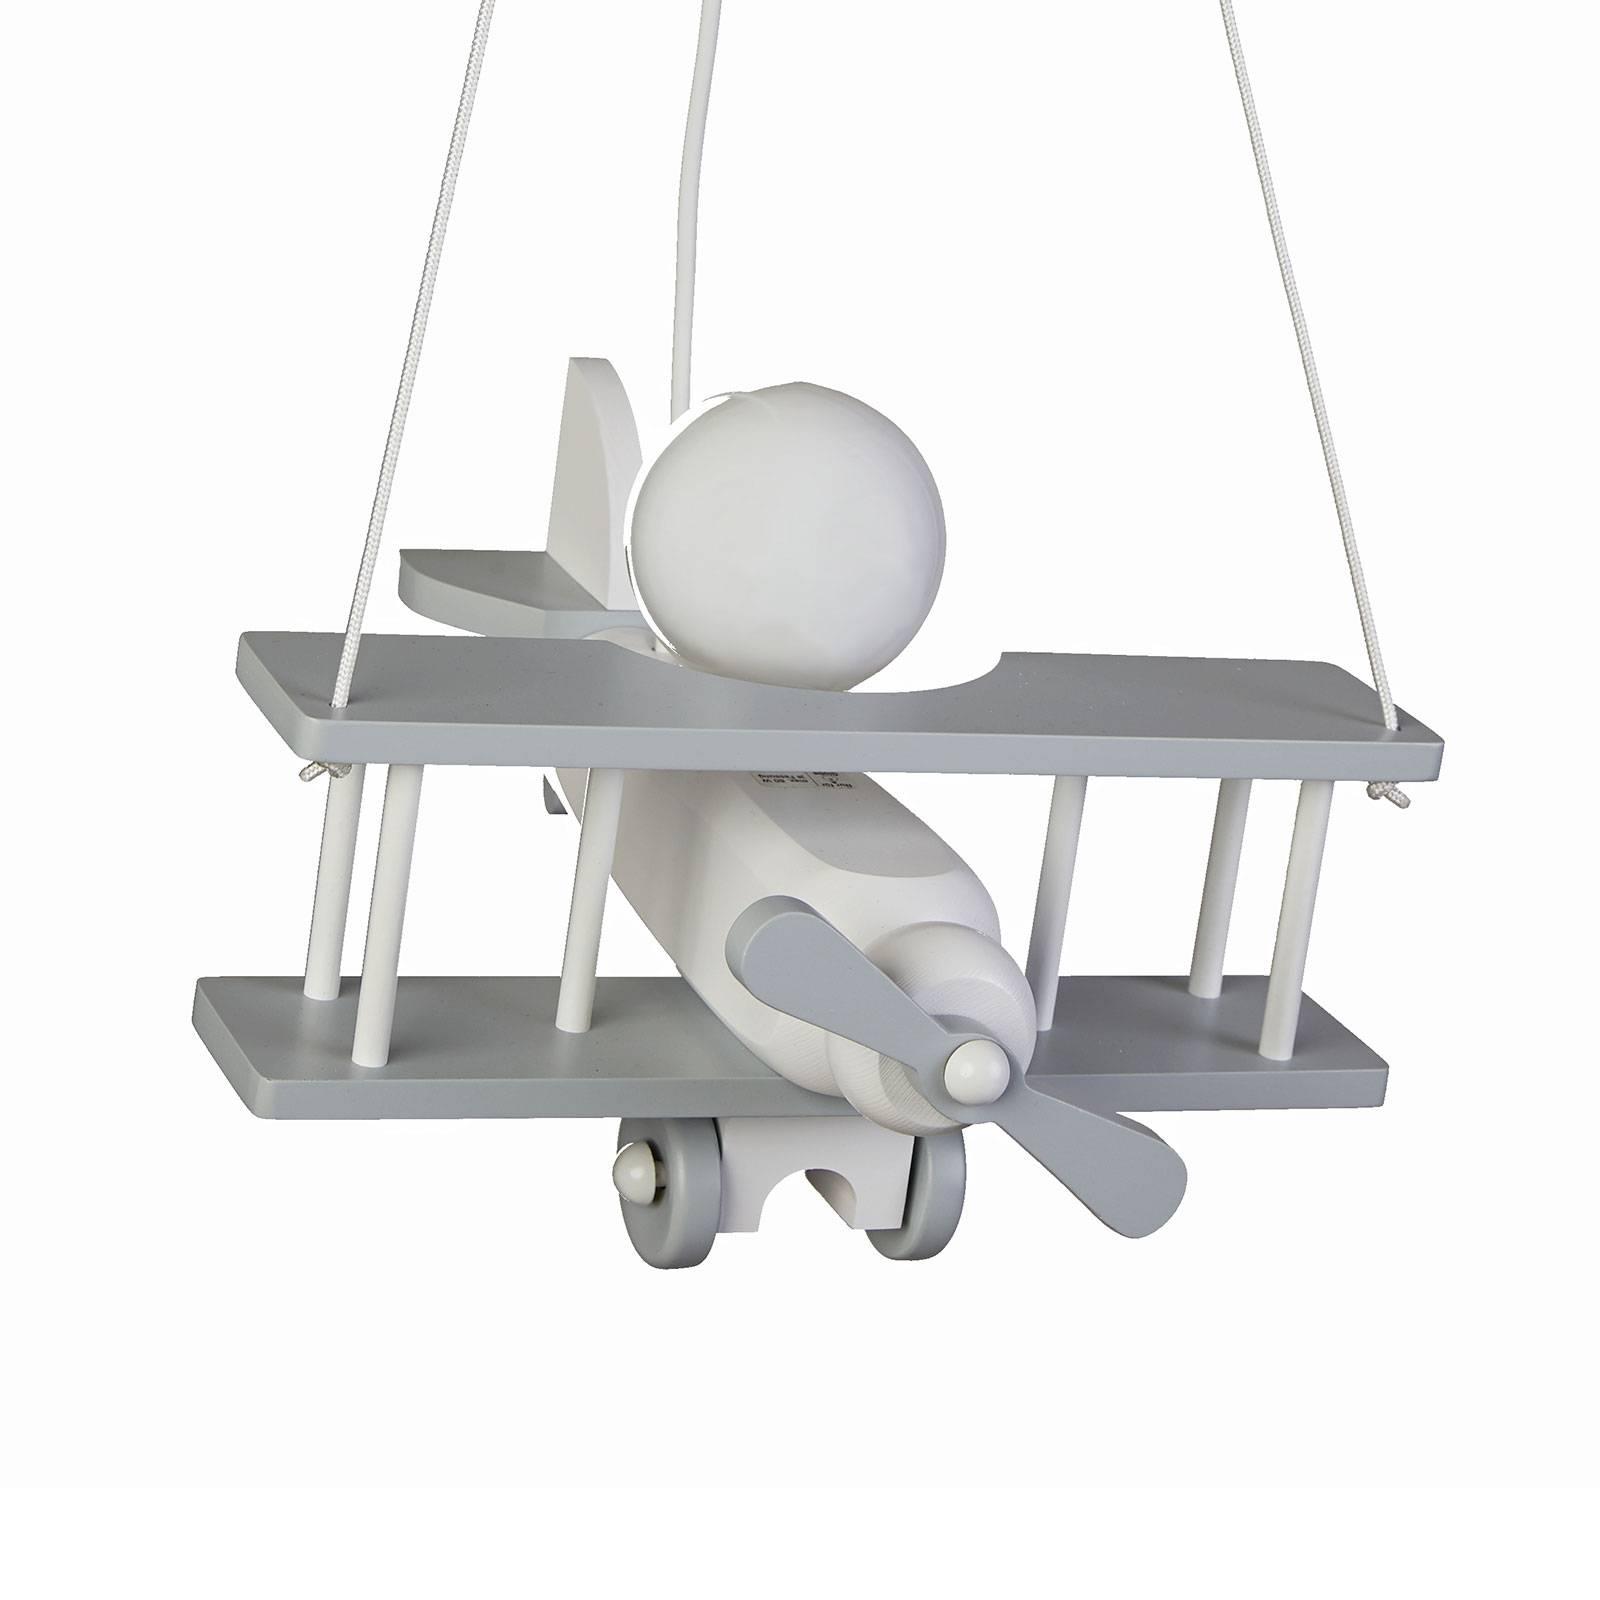 Hanglamp vliegtuig, massief hout, grijs-wit